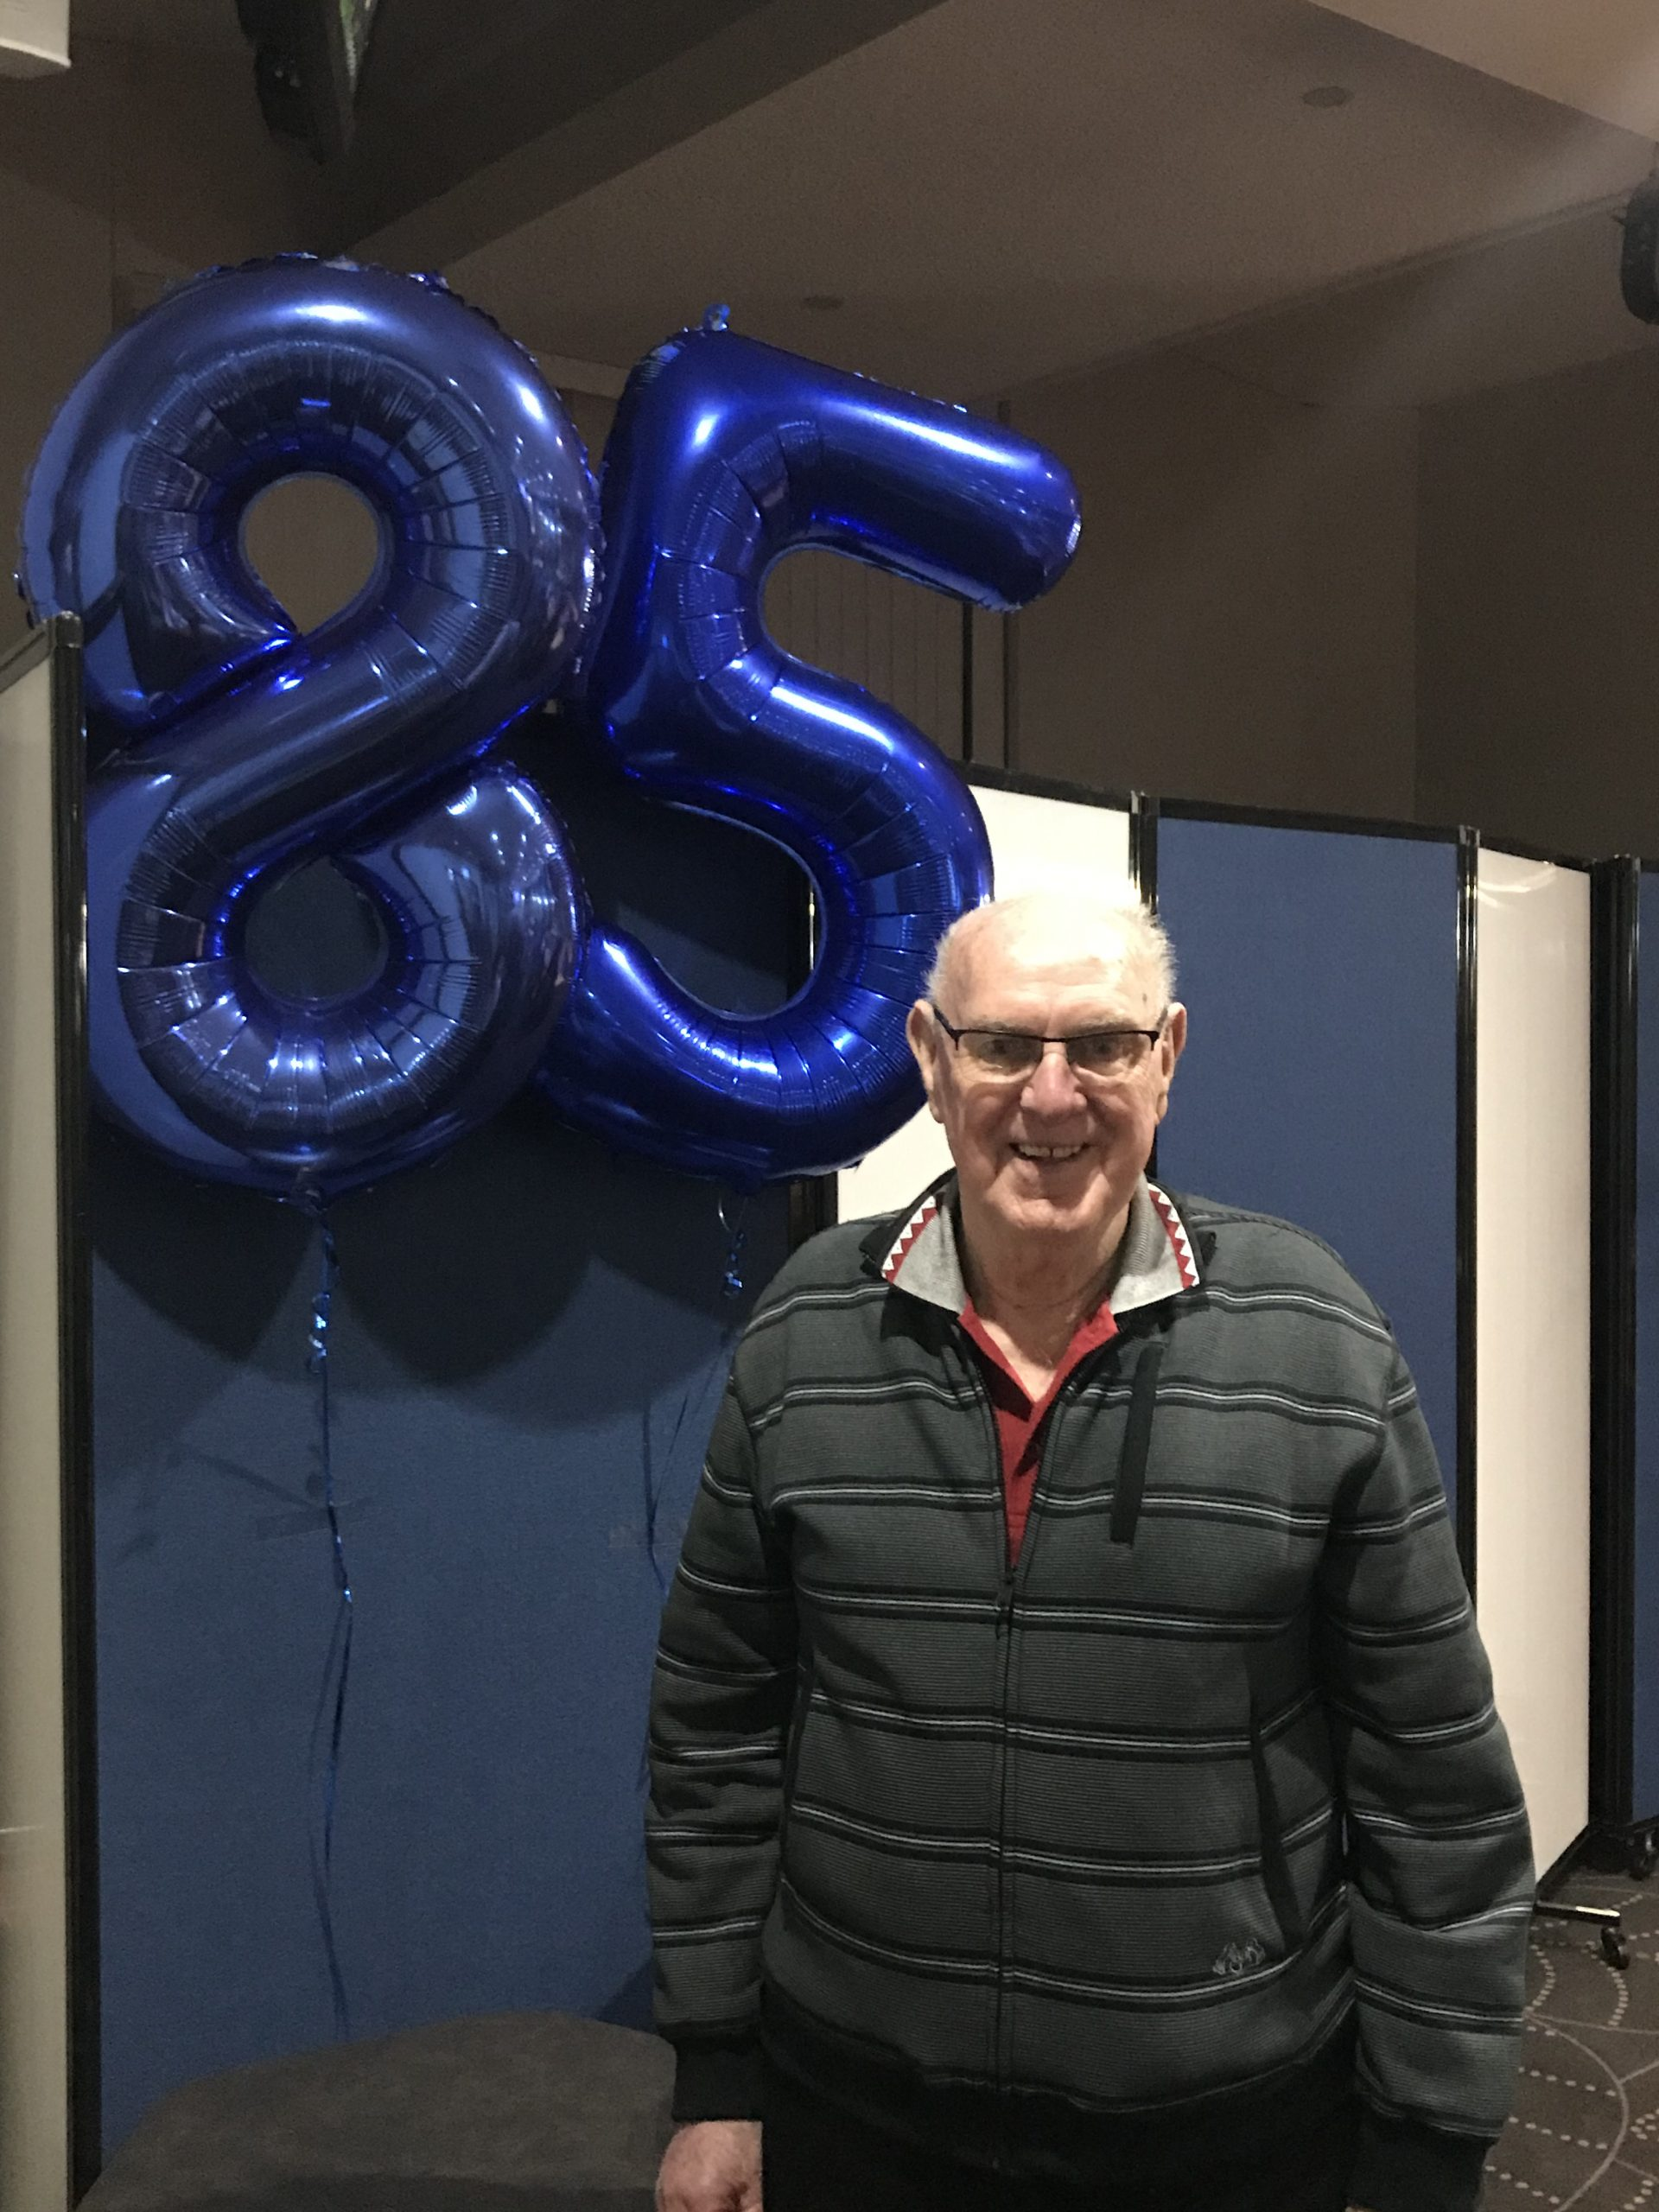 Happy 85th birthday Noel Toohey!